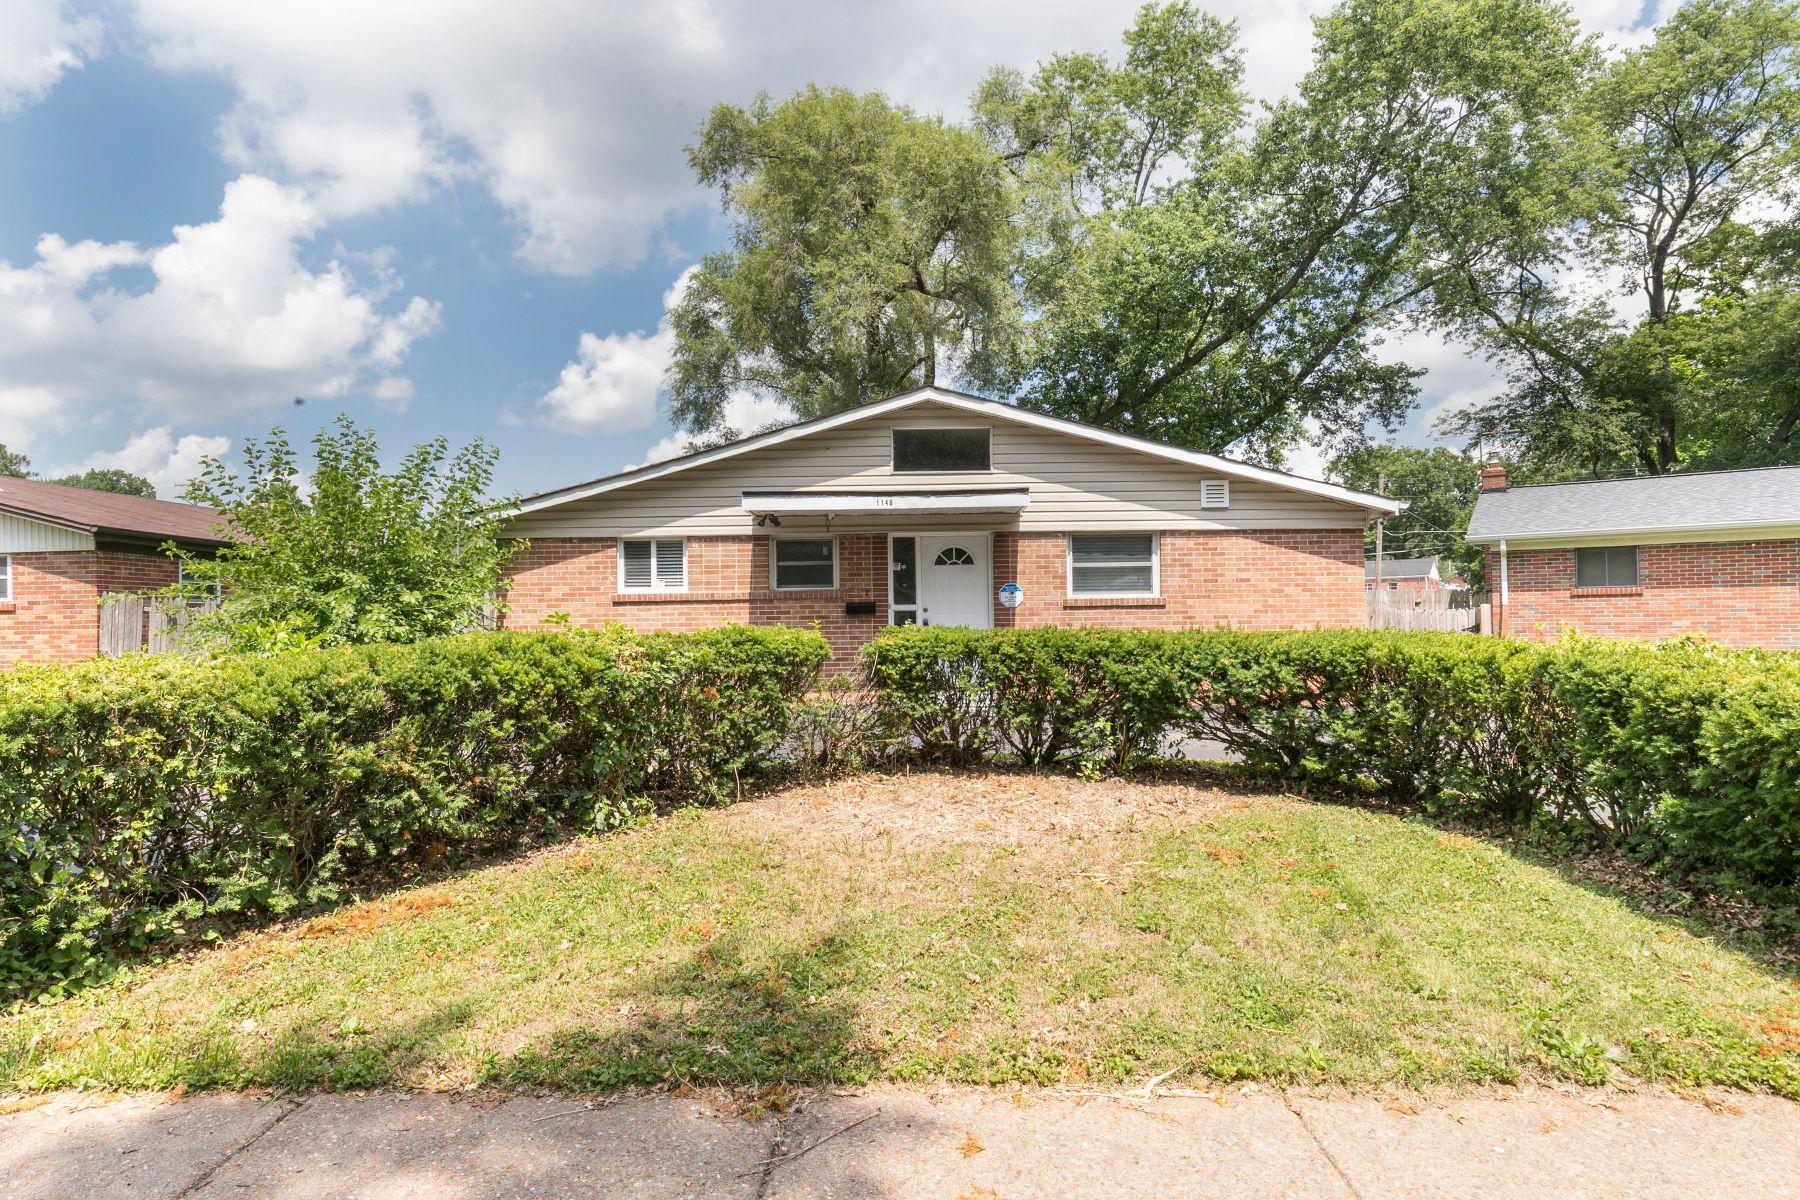 Single Family Homes for Sale at Charming Bungalow In University City 1146 Glenside Lane University City, Missouri 63130 United States